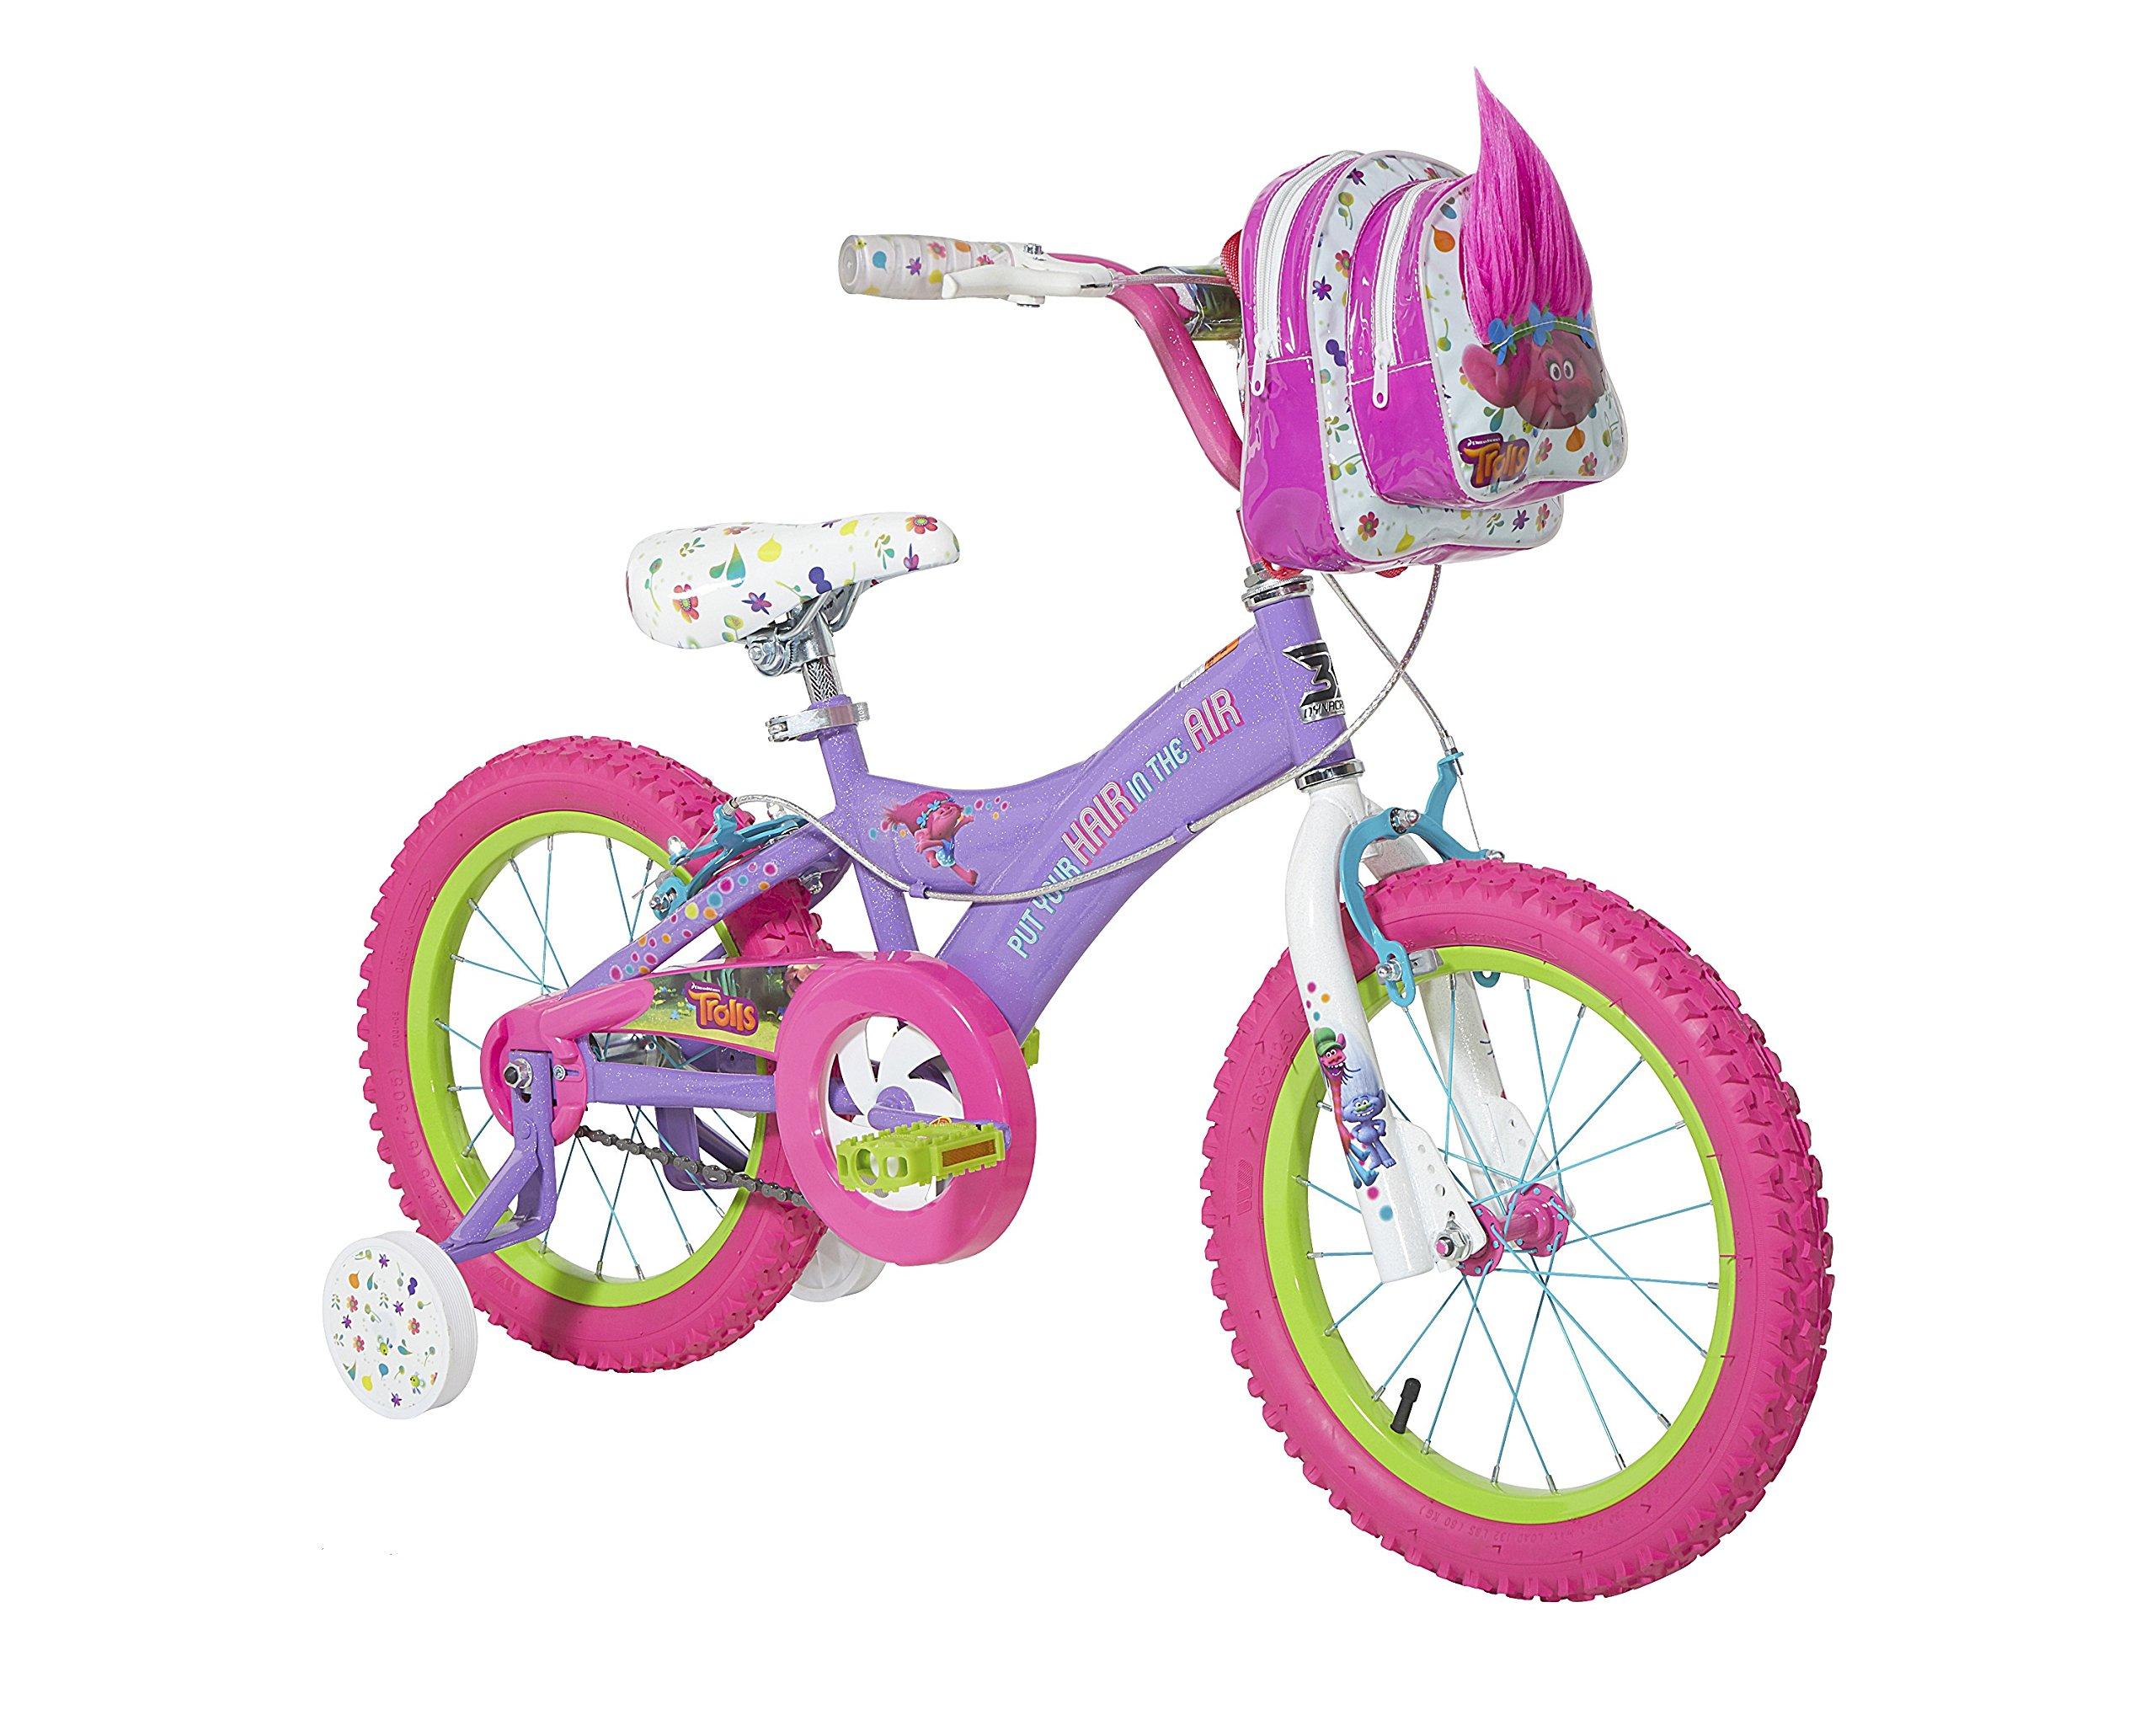 Trolls Dynacraft Girls BMX Street/Dirt Bike with Hand Brake 16'''' Purple/Pink/Green